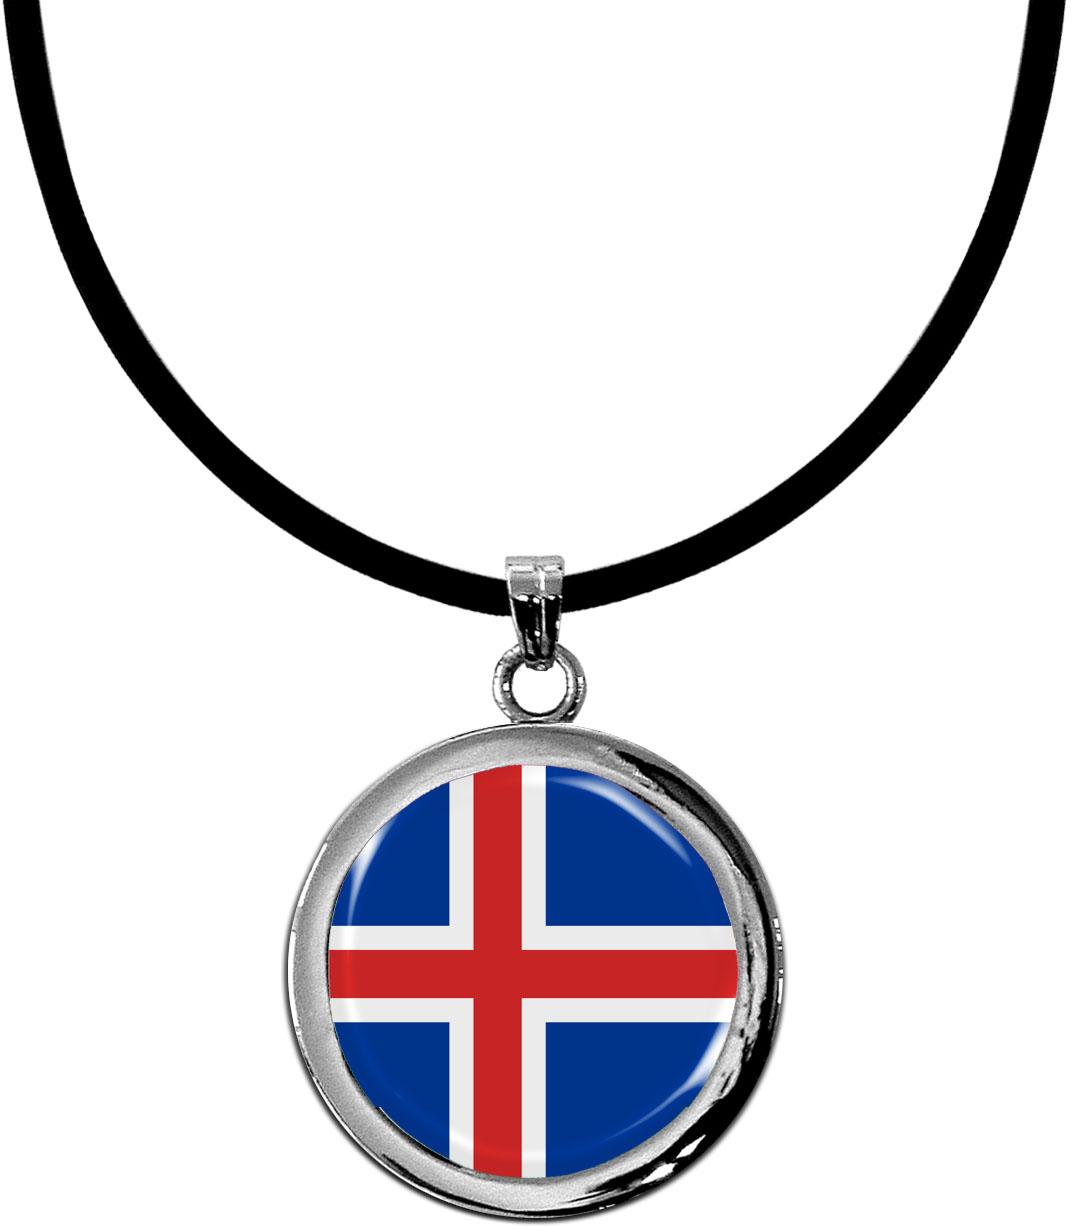 Kettenanhänger / Island / Silikonband mit Silberverschluss